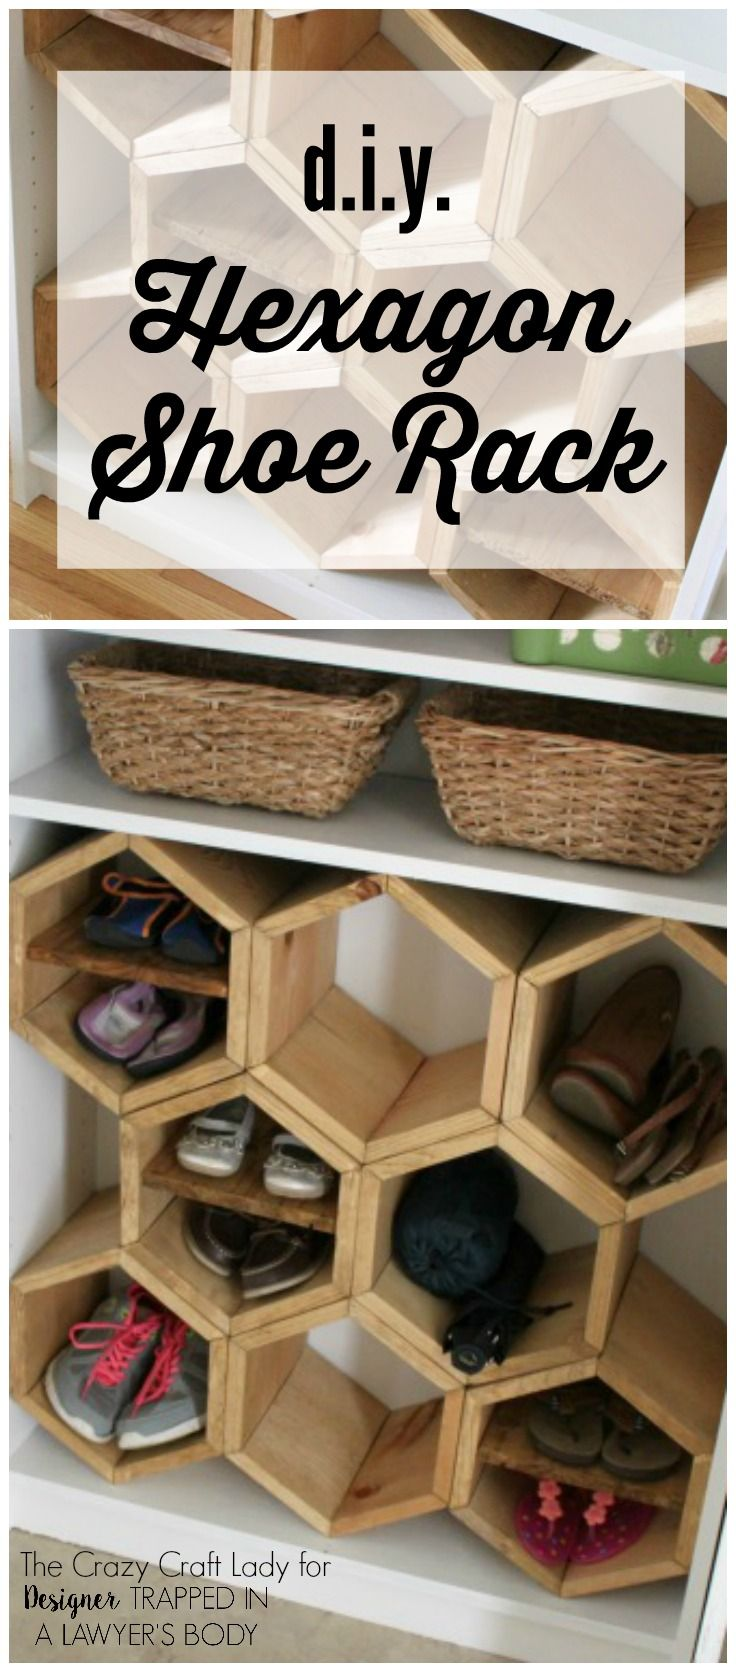 hexagon diy shoe rack diy shoe rack crafts old bookshelves on wood shoe rack diy simple id=65060